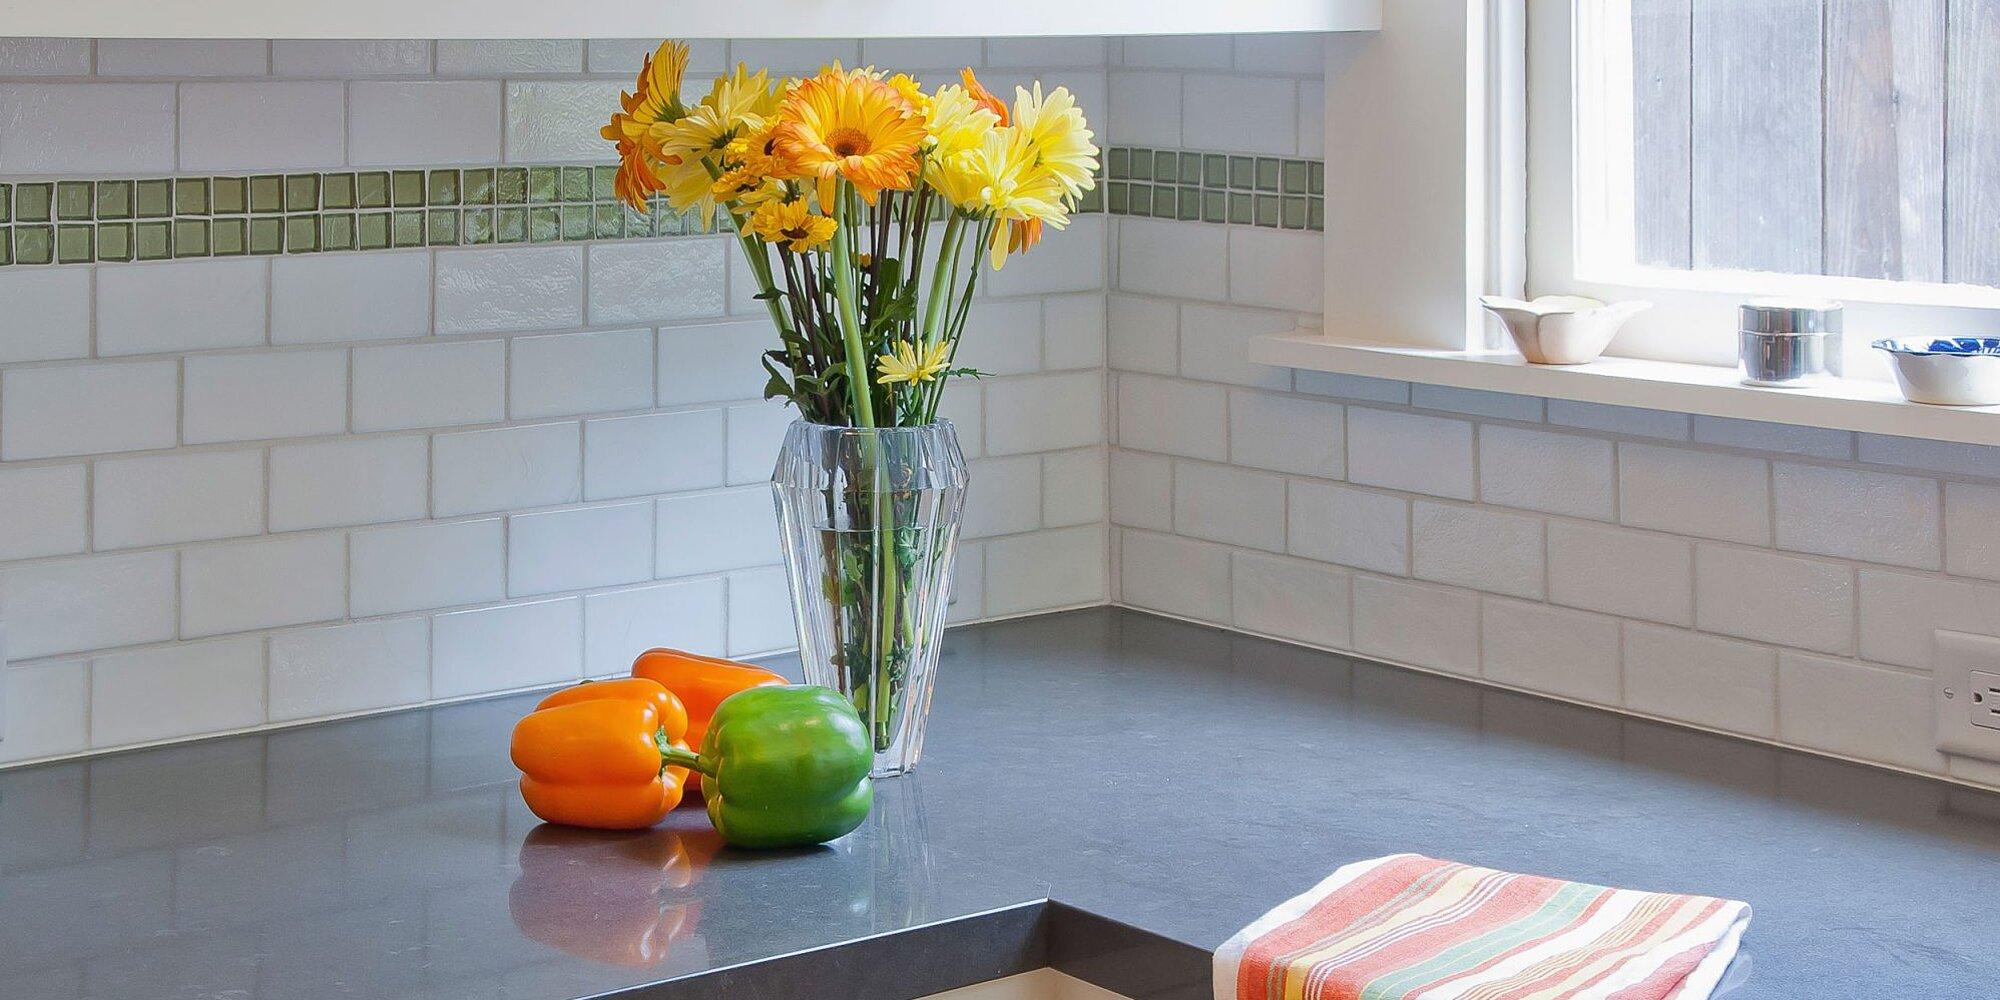 How To Get Rid Of Lingering Kitchen Smells Myrecipes